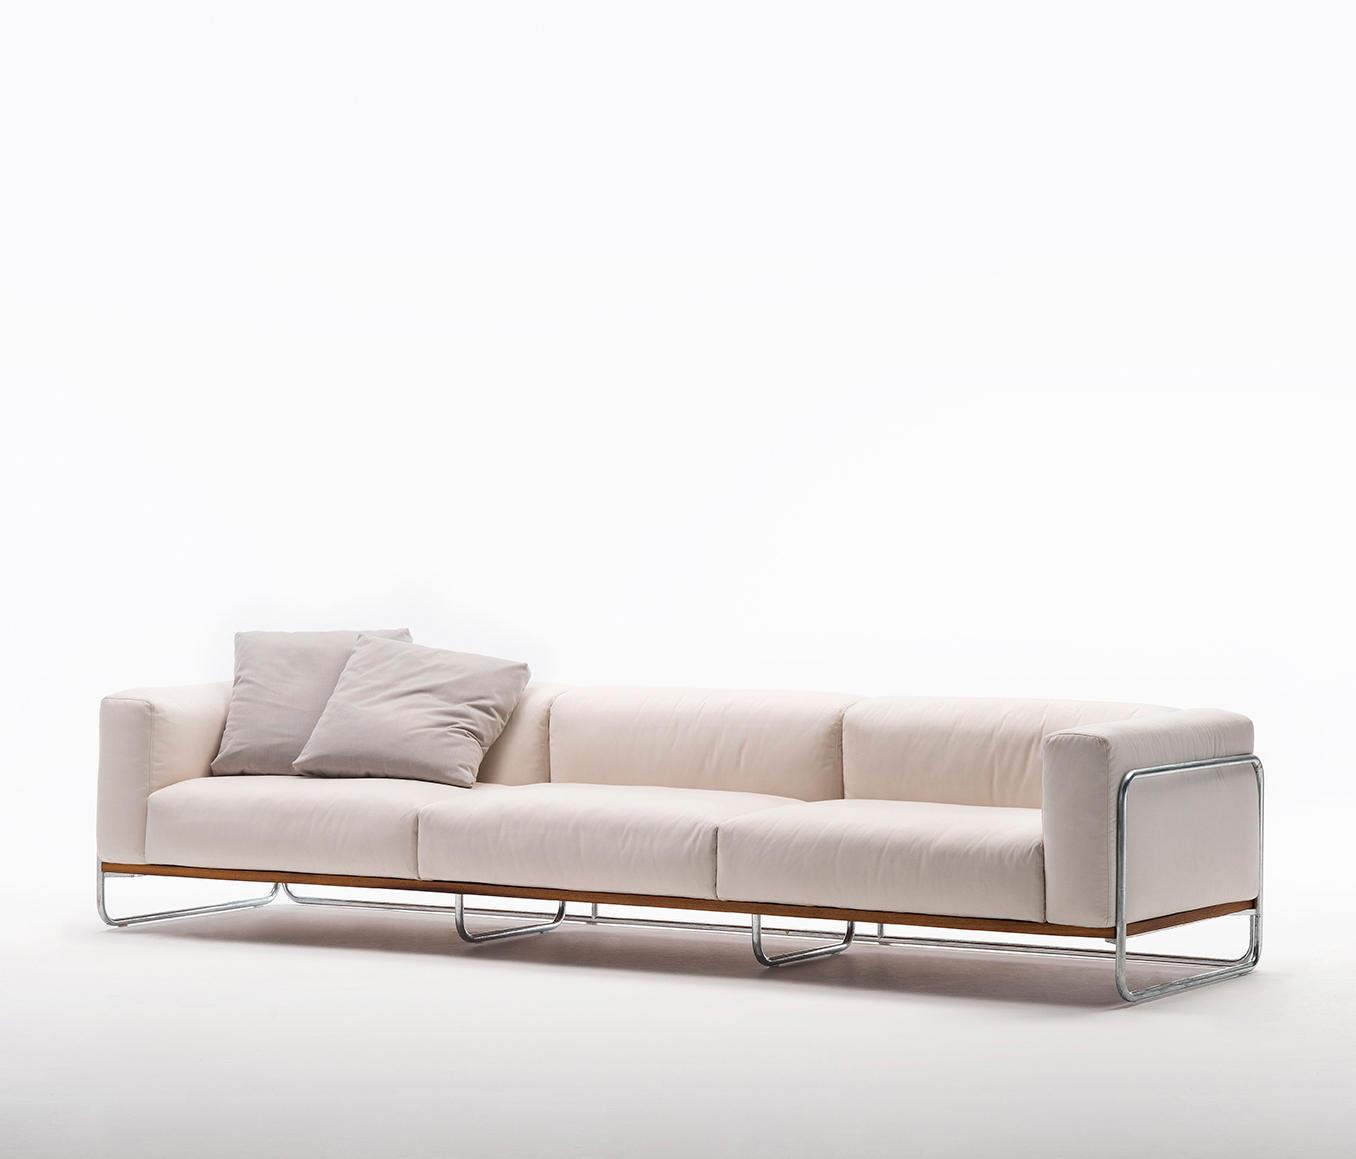 filo outdoor garden sofas from living divani architonic. Black Bedroom Furniture Sets. Home Design Ideas